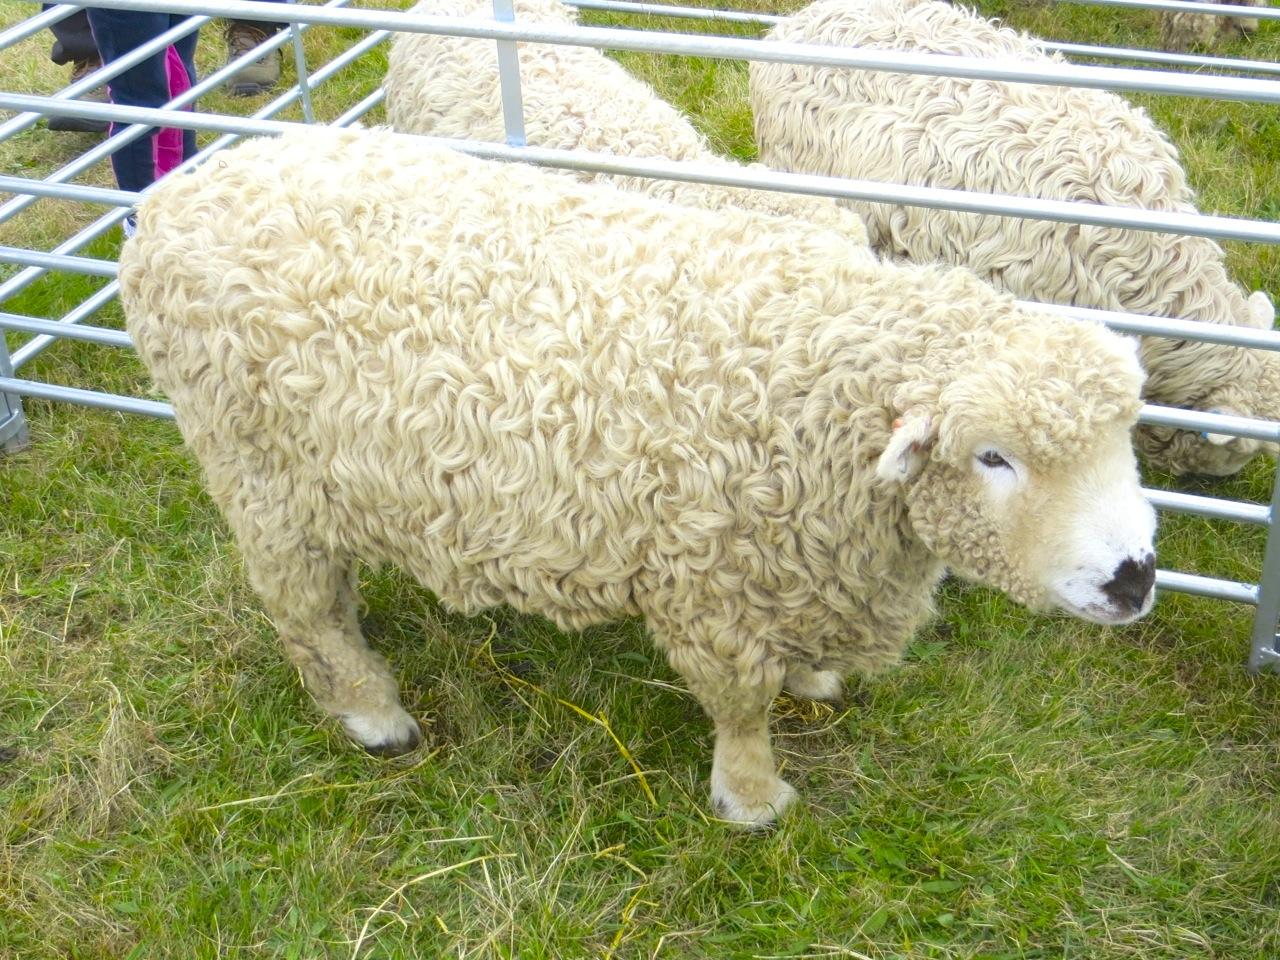 Dorset sheep